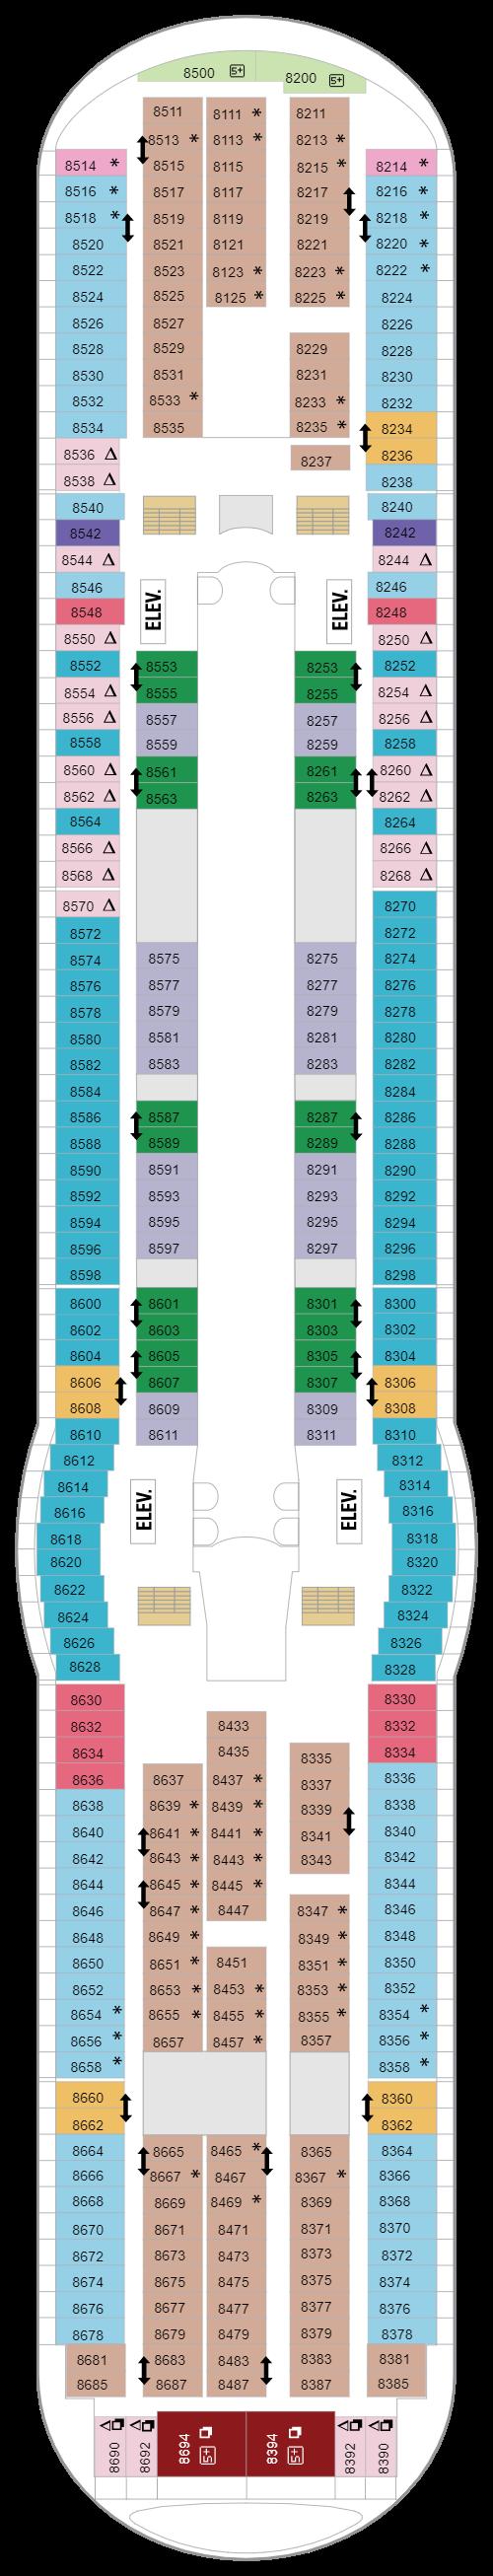 Deck 8 (April 21st, 2021 - April 30th, 2022)